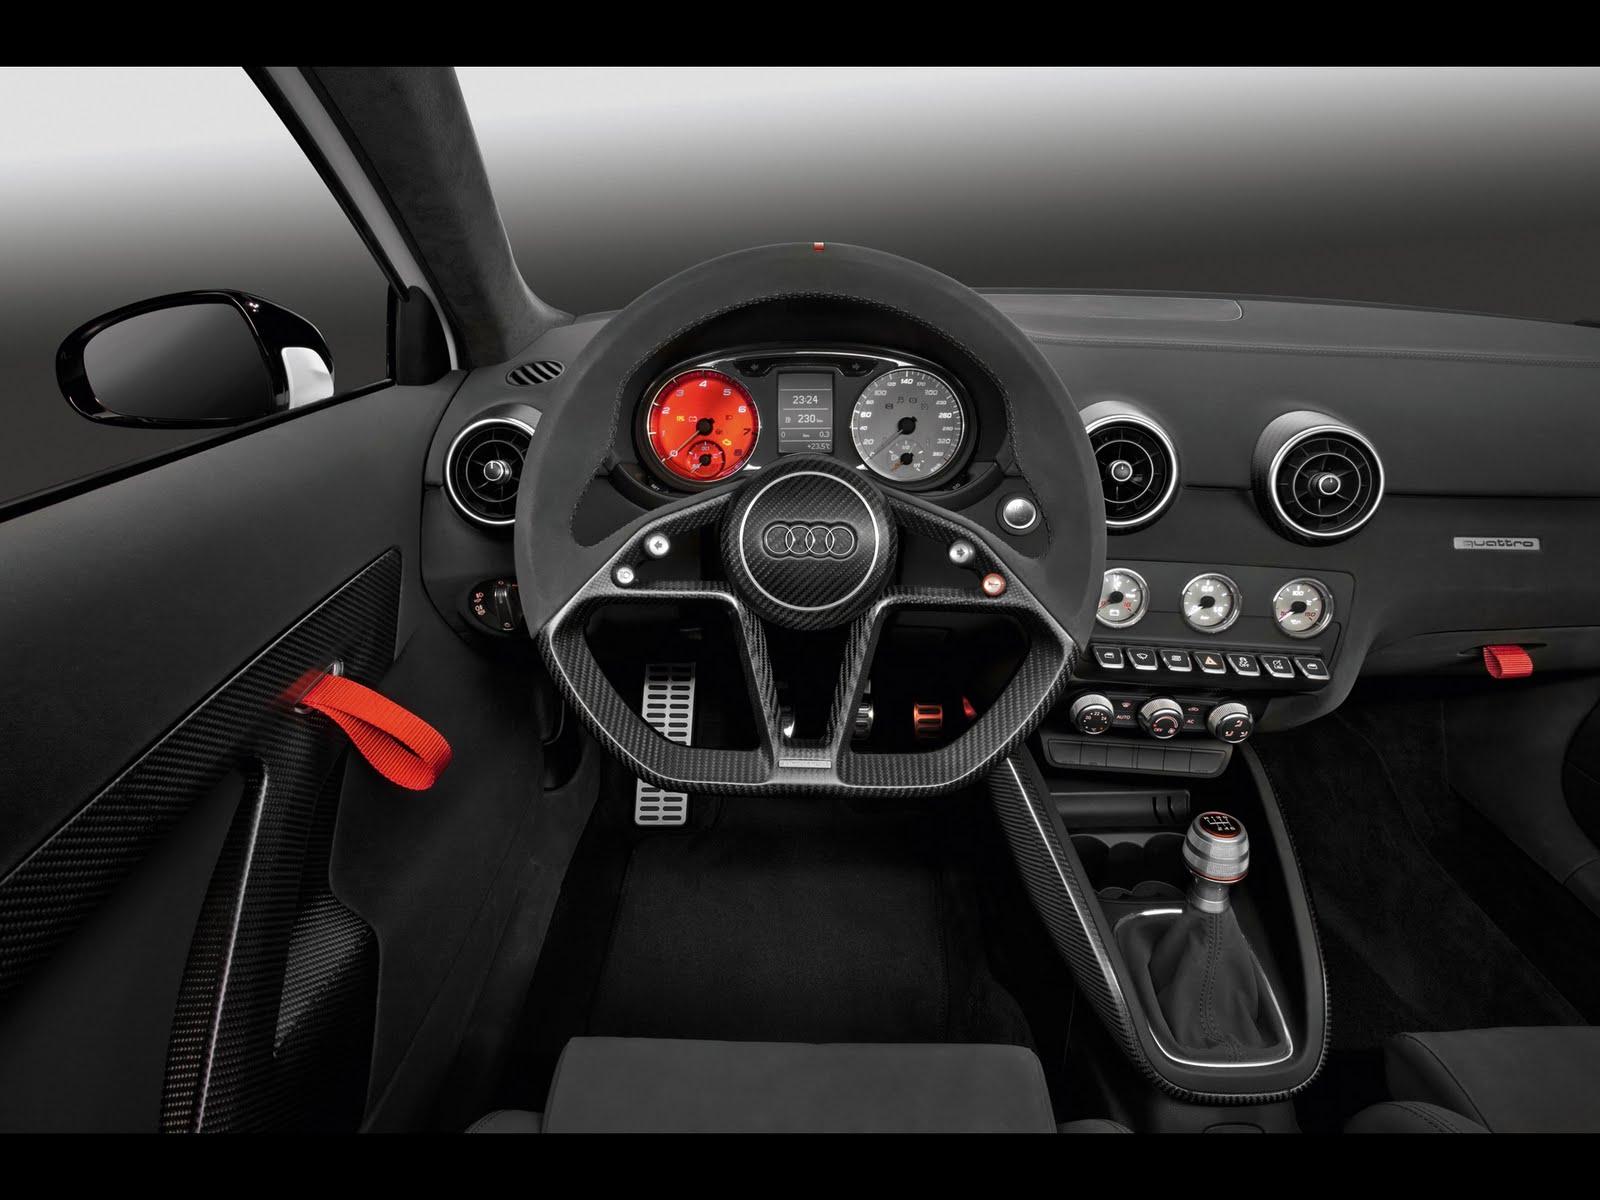 http://2.bp.blogspot.com/-sC7NVn-TLyE/TfMsK33_eII/AAAAAAAAAYE/n3tB2GT95VQ/s1600/2011-Audi-A1-clubsport-quattro-Dashboard-1920x1440.jpeg